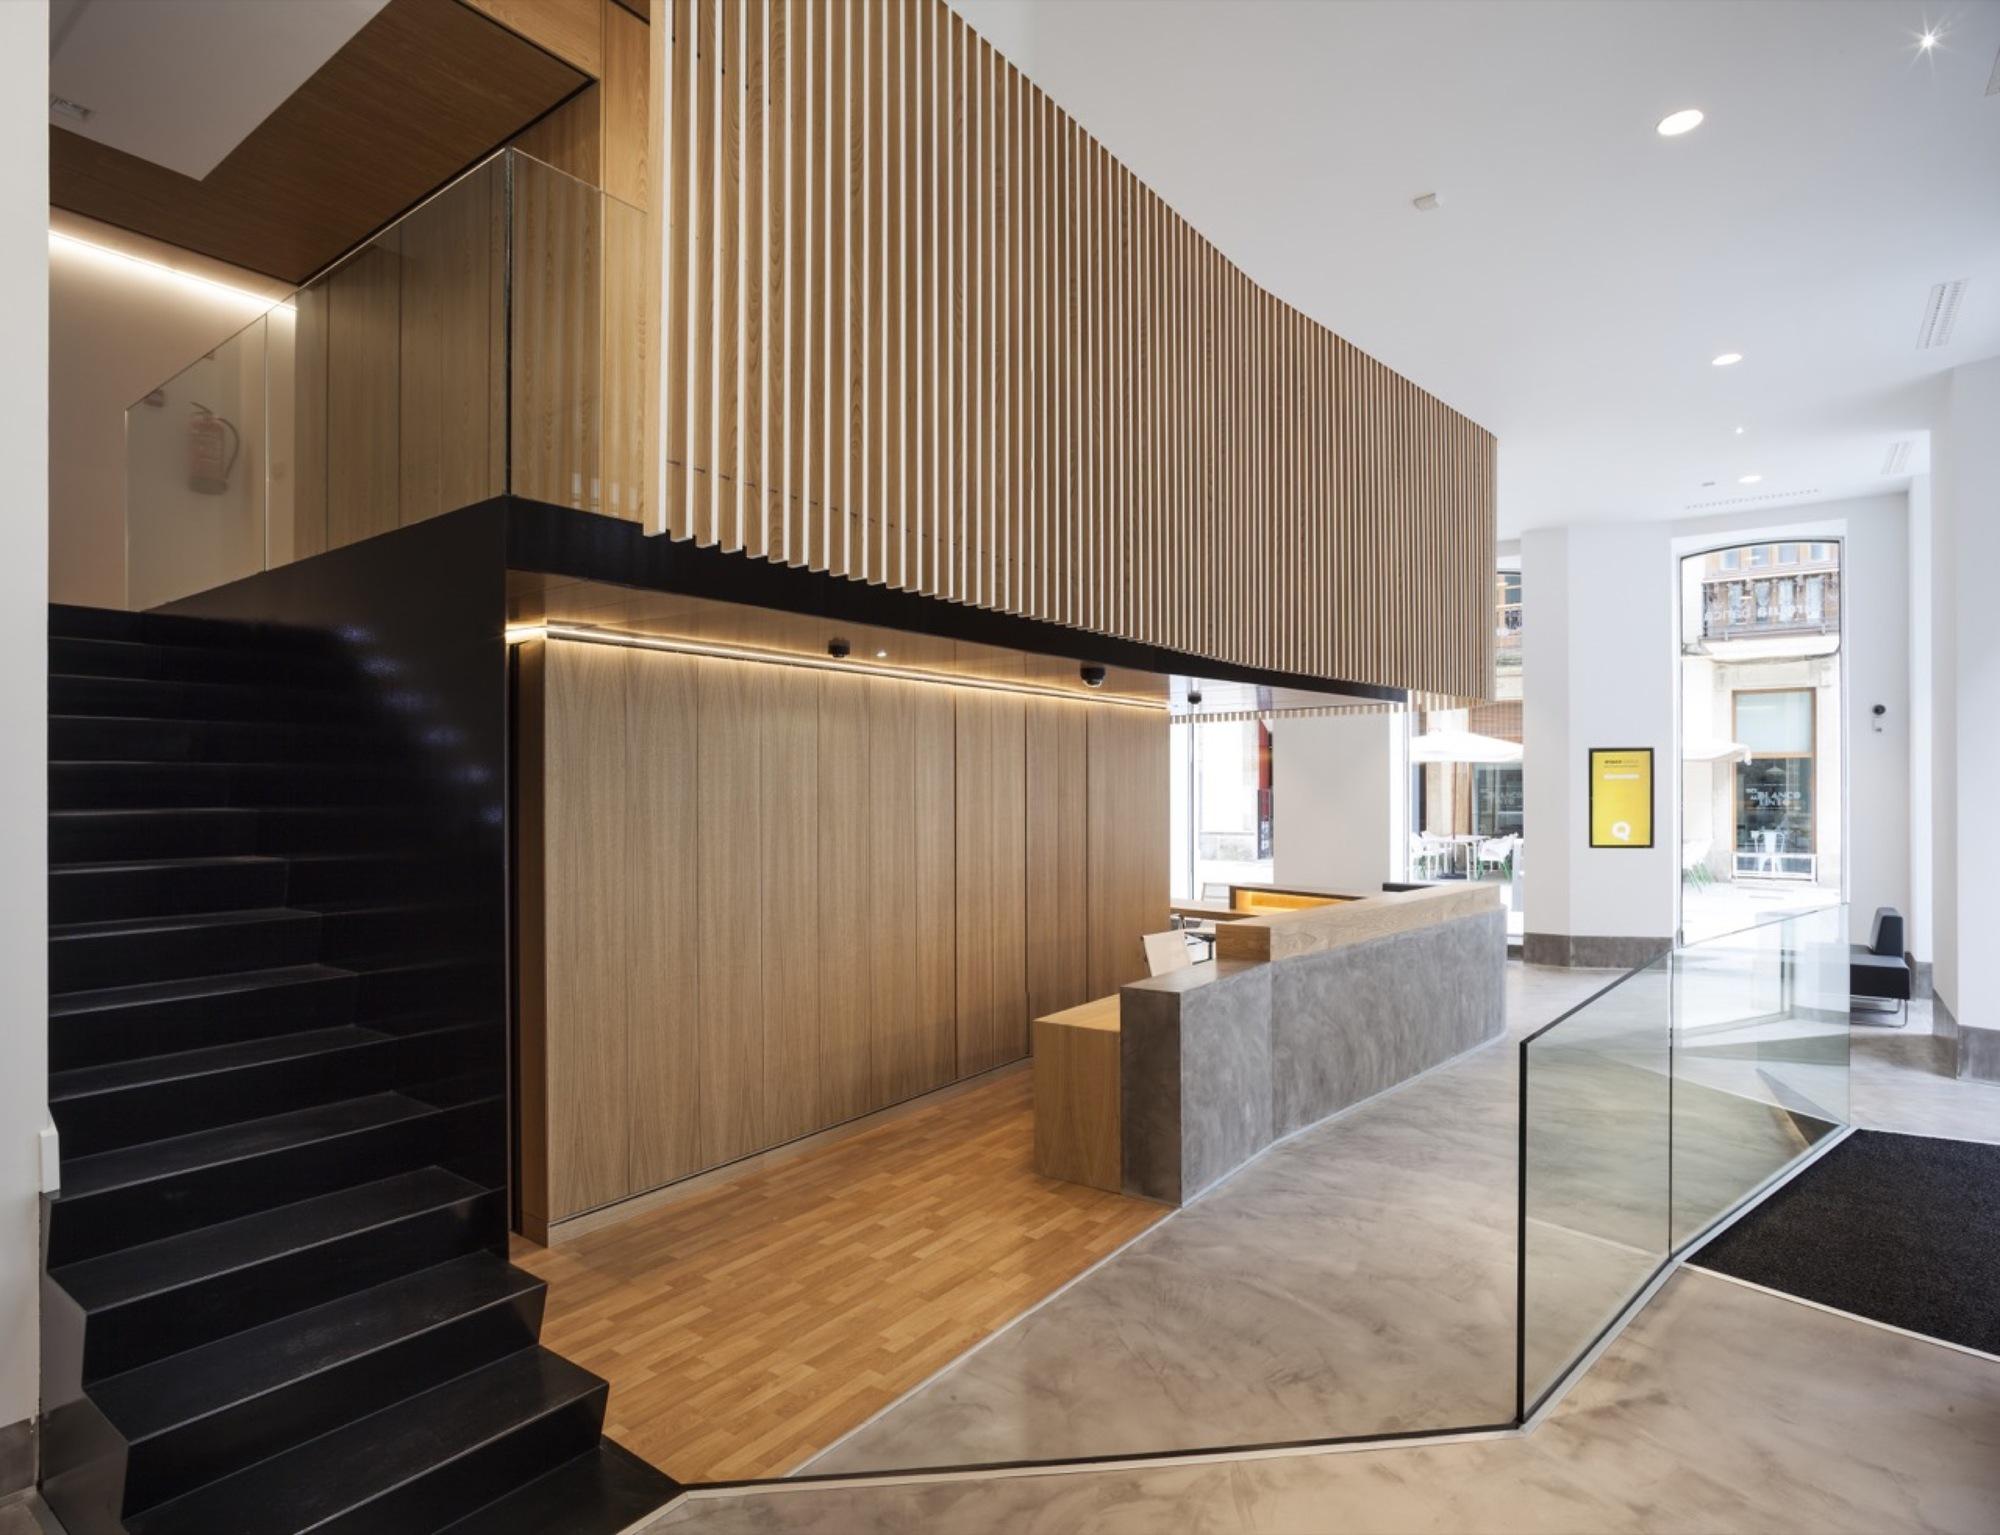 Gallery of bank office rubio bilbao arquitectos 12 for Caja rural bilbao oficinas